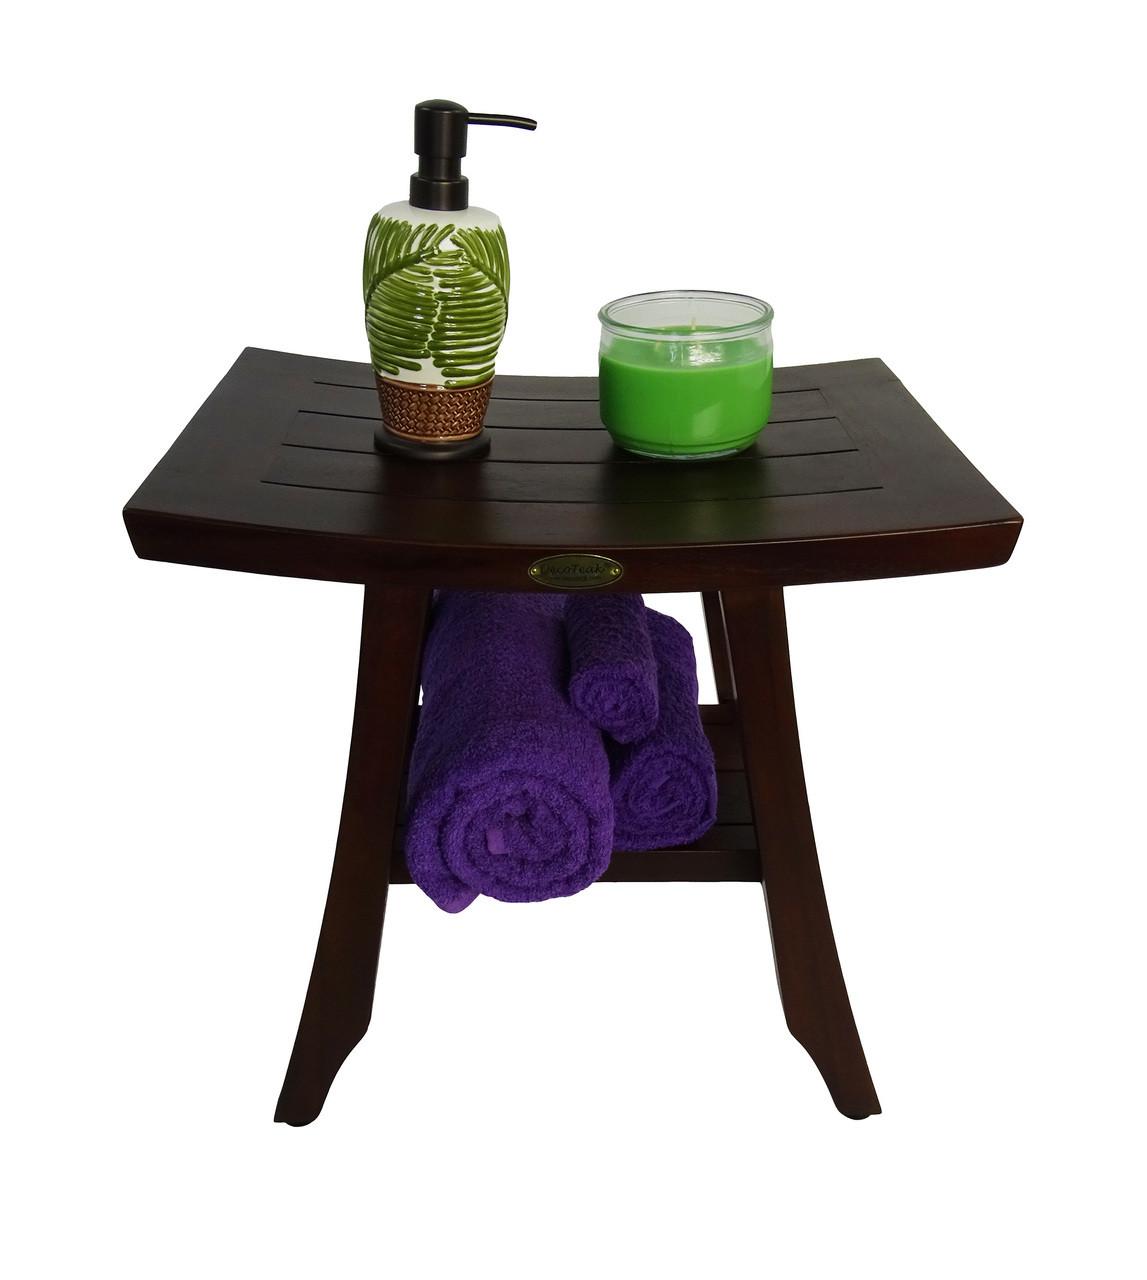 "DecoTeak Satori 18"" Teak Wood Fully Assembled Shower Bench with Shelf in Woodland Brown Finish"